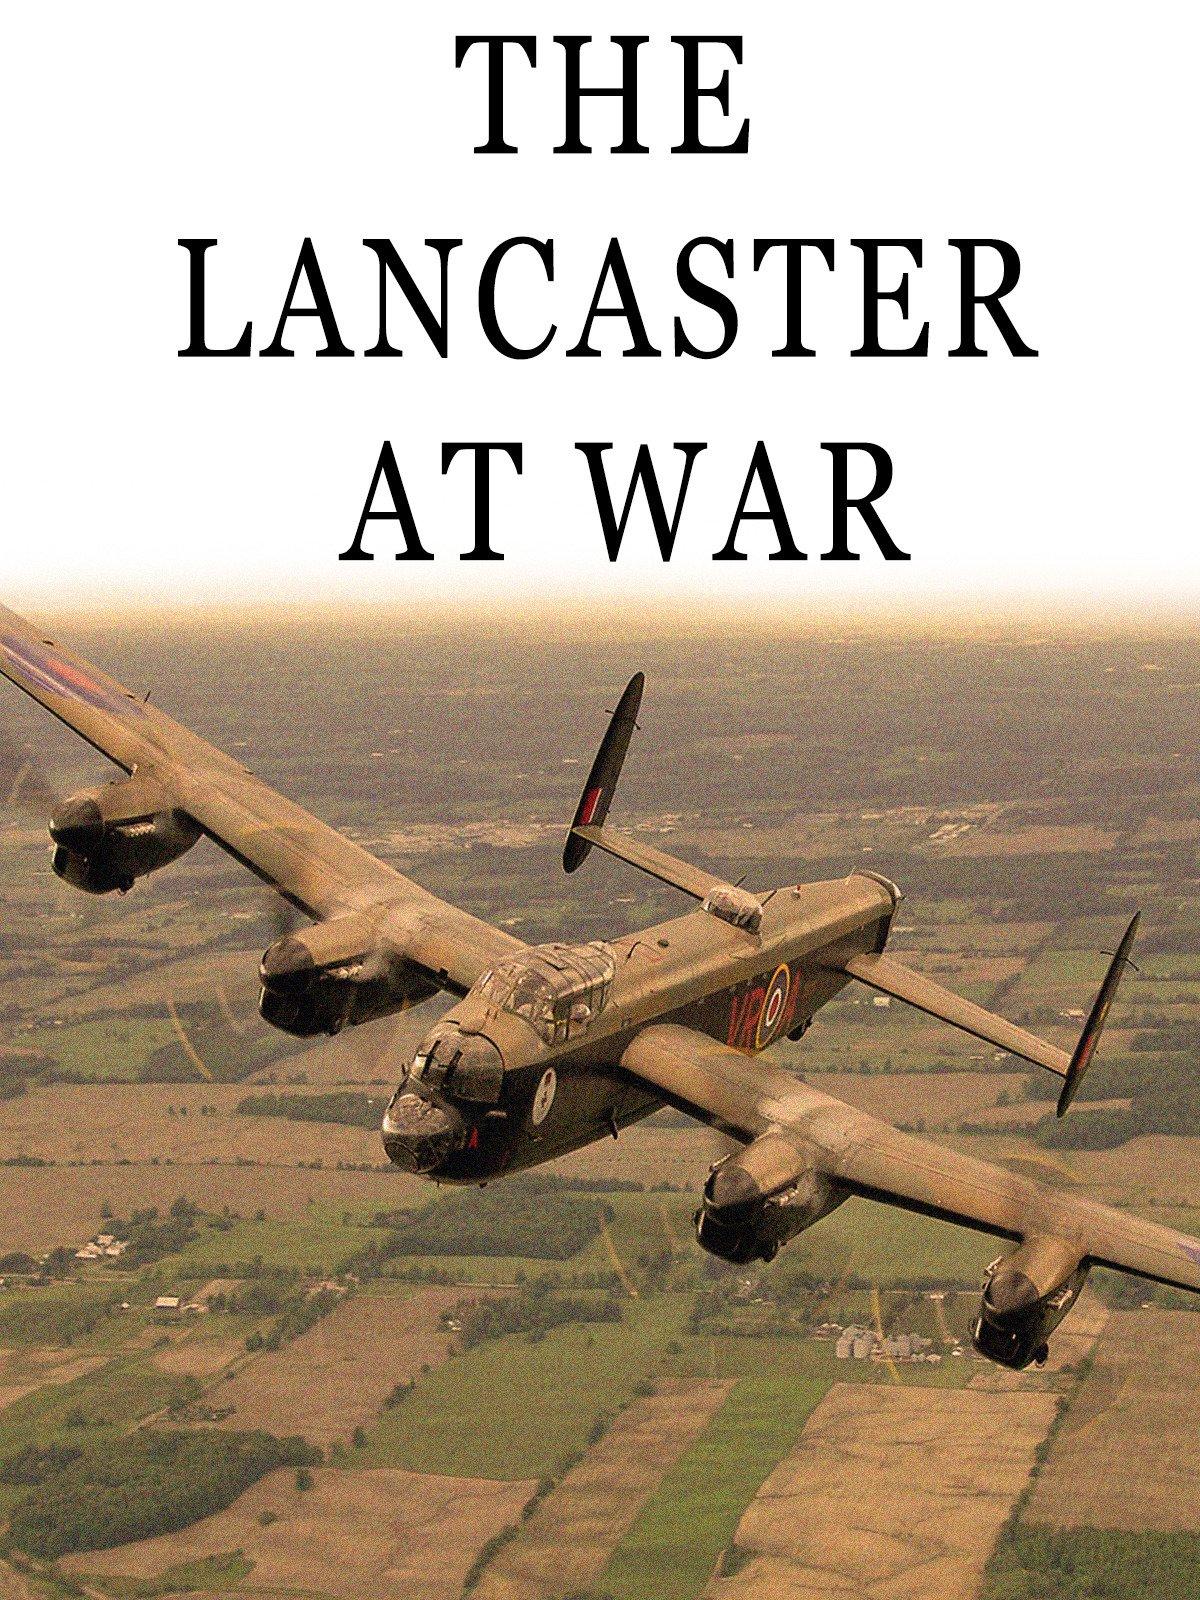 The Lancaster at War